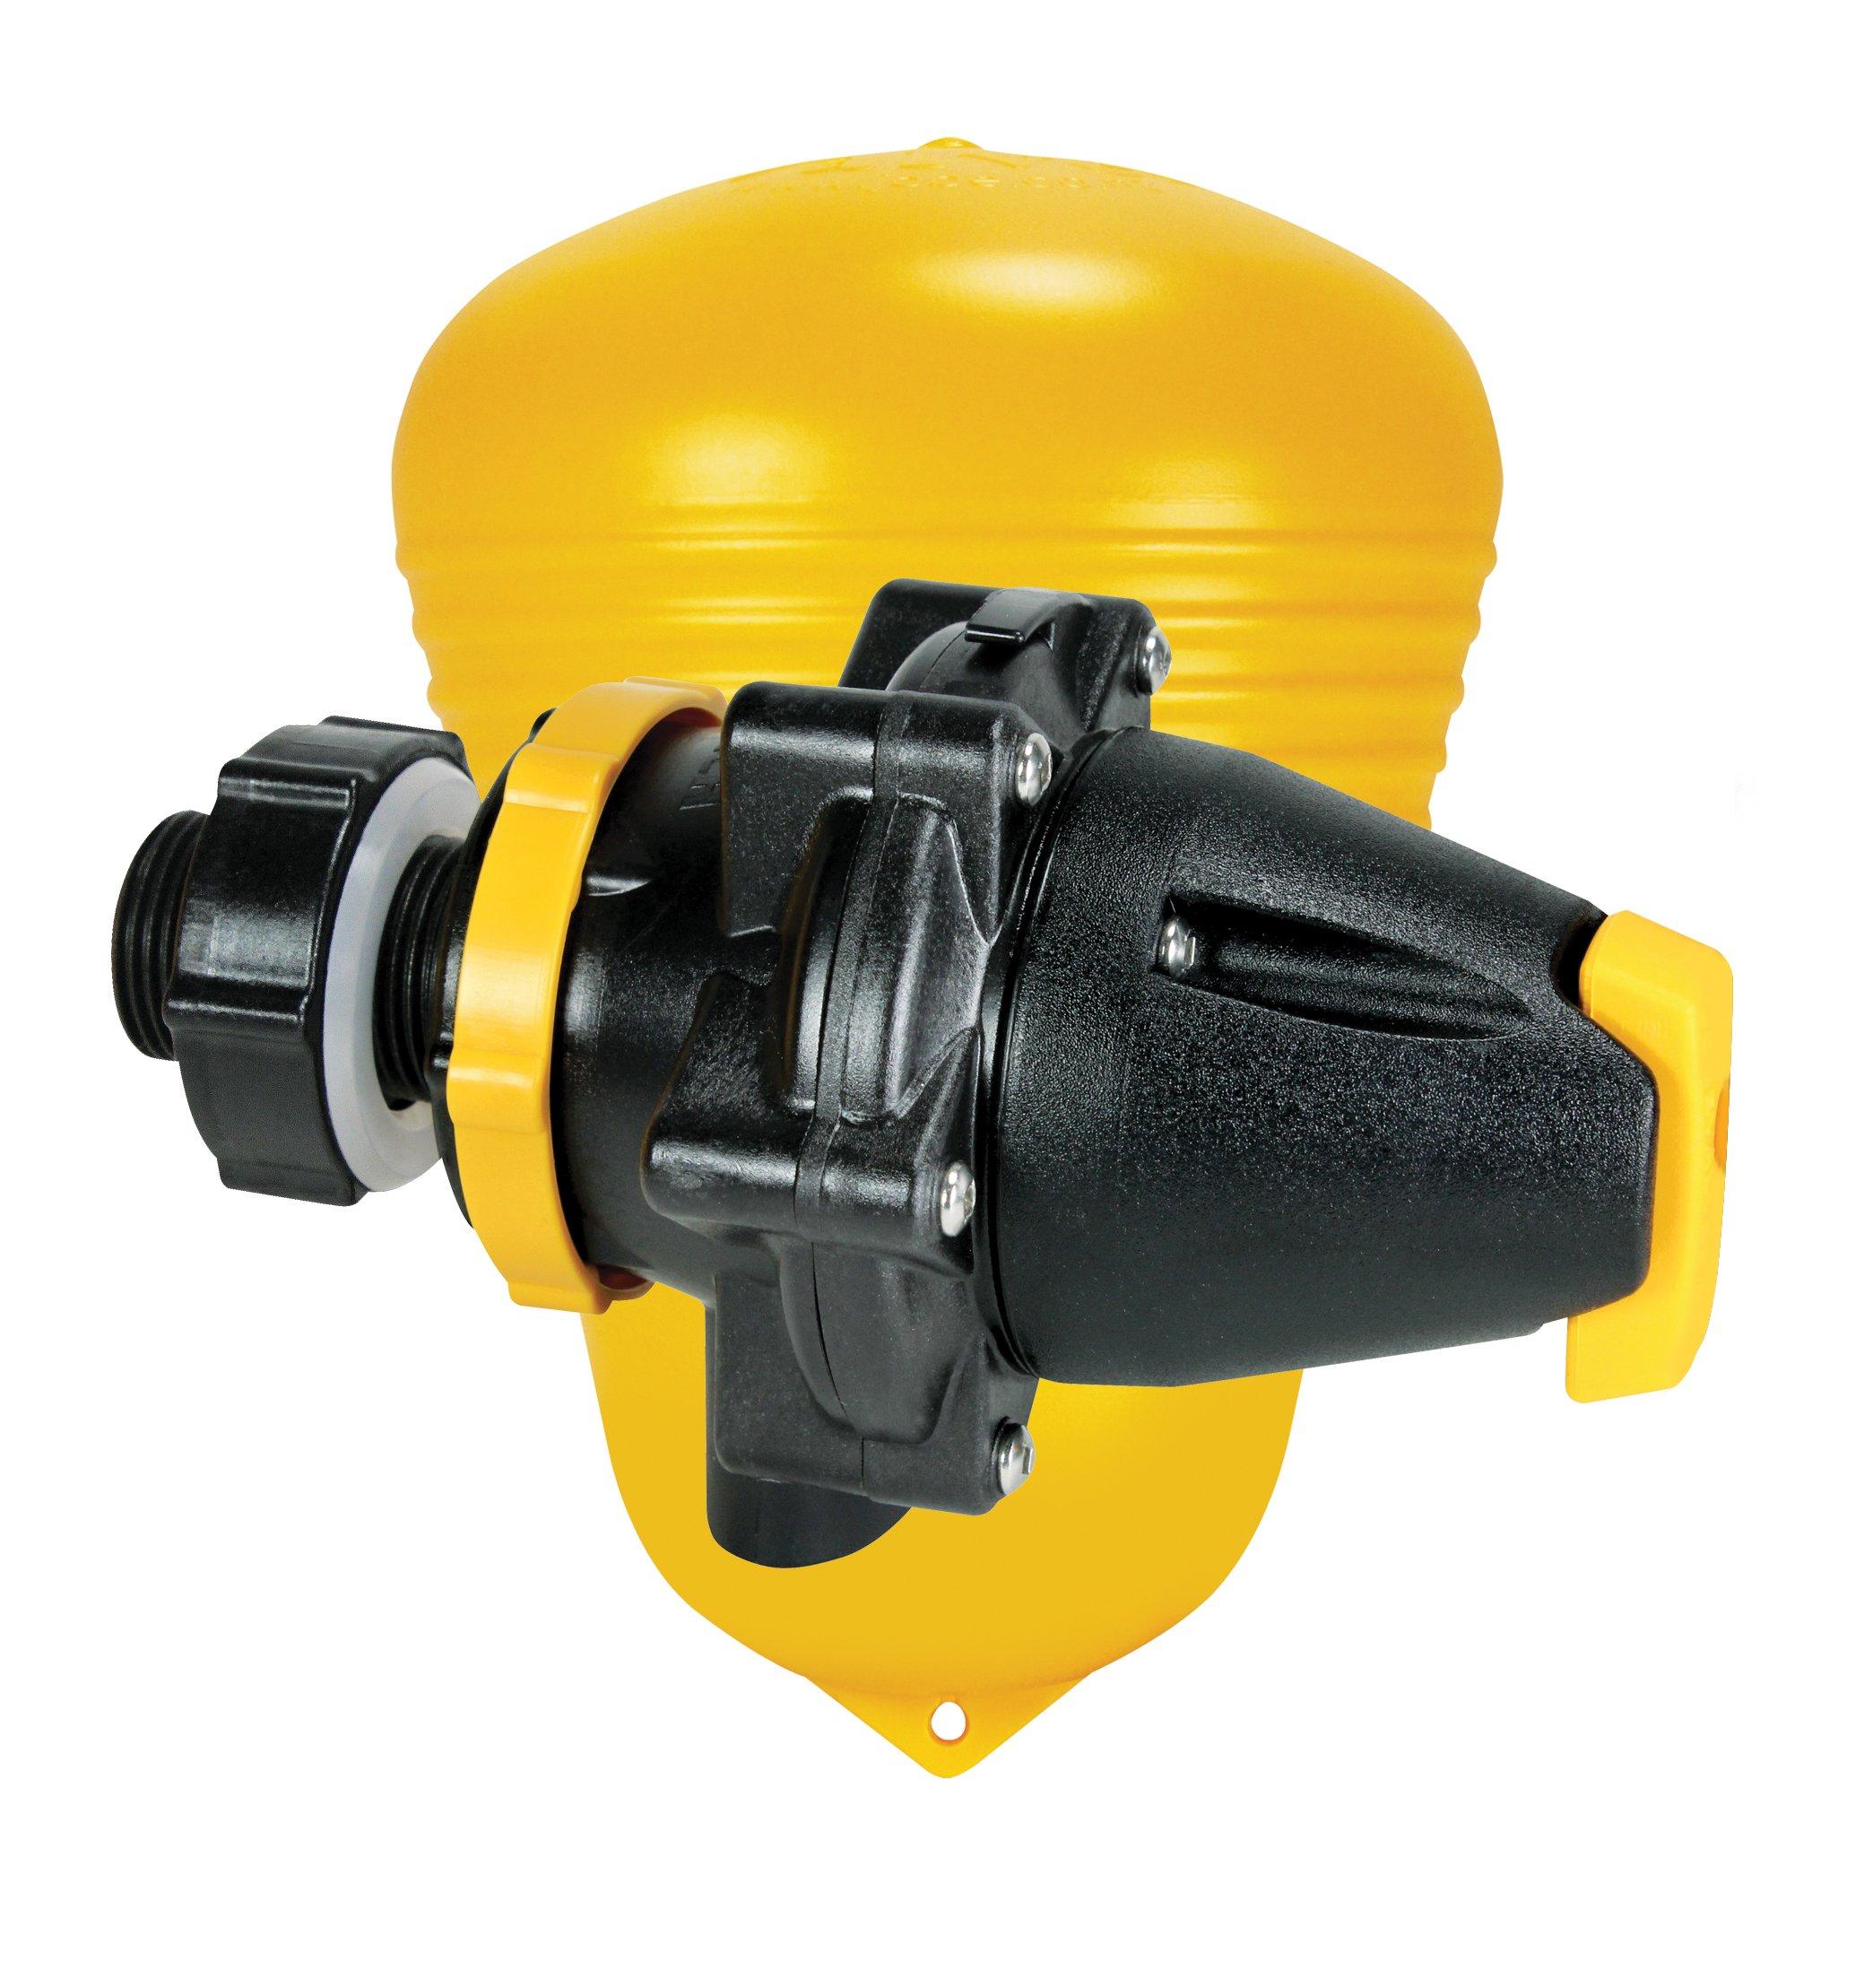 Jobe Valves Megaflow Valve with Short Tail, 1.25'', Yellow/Black